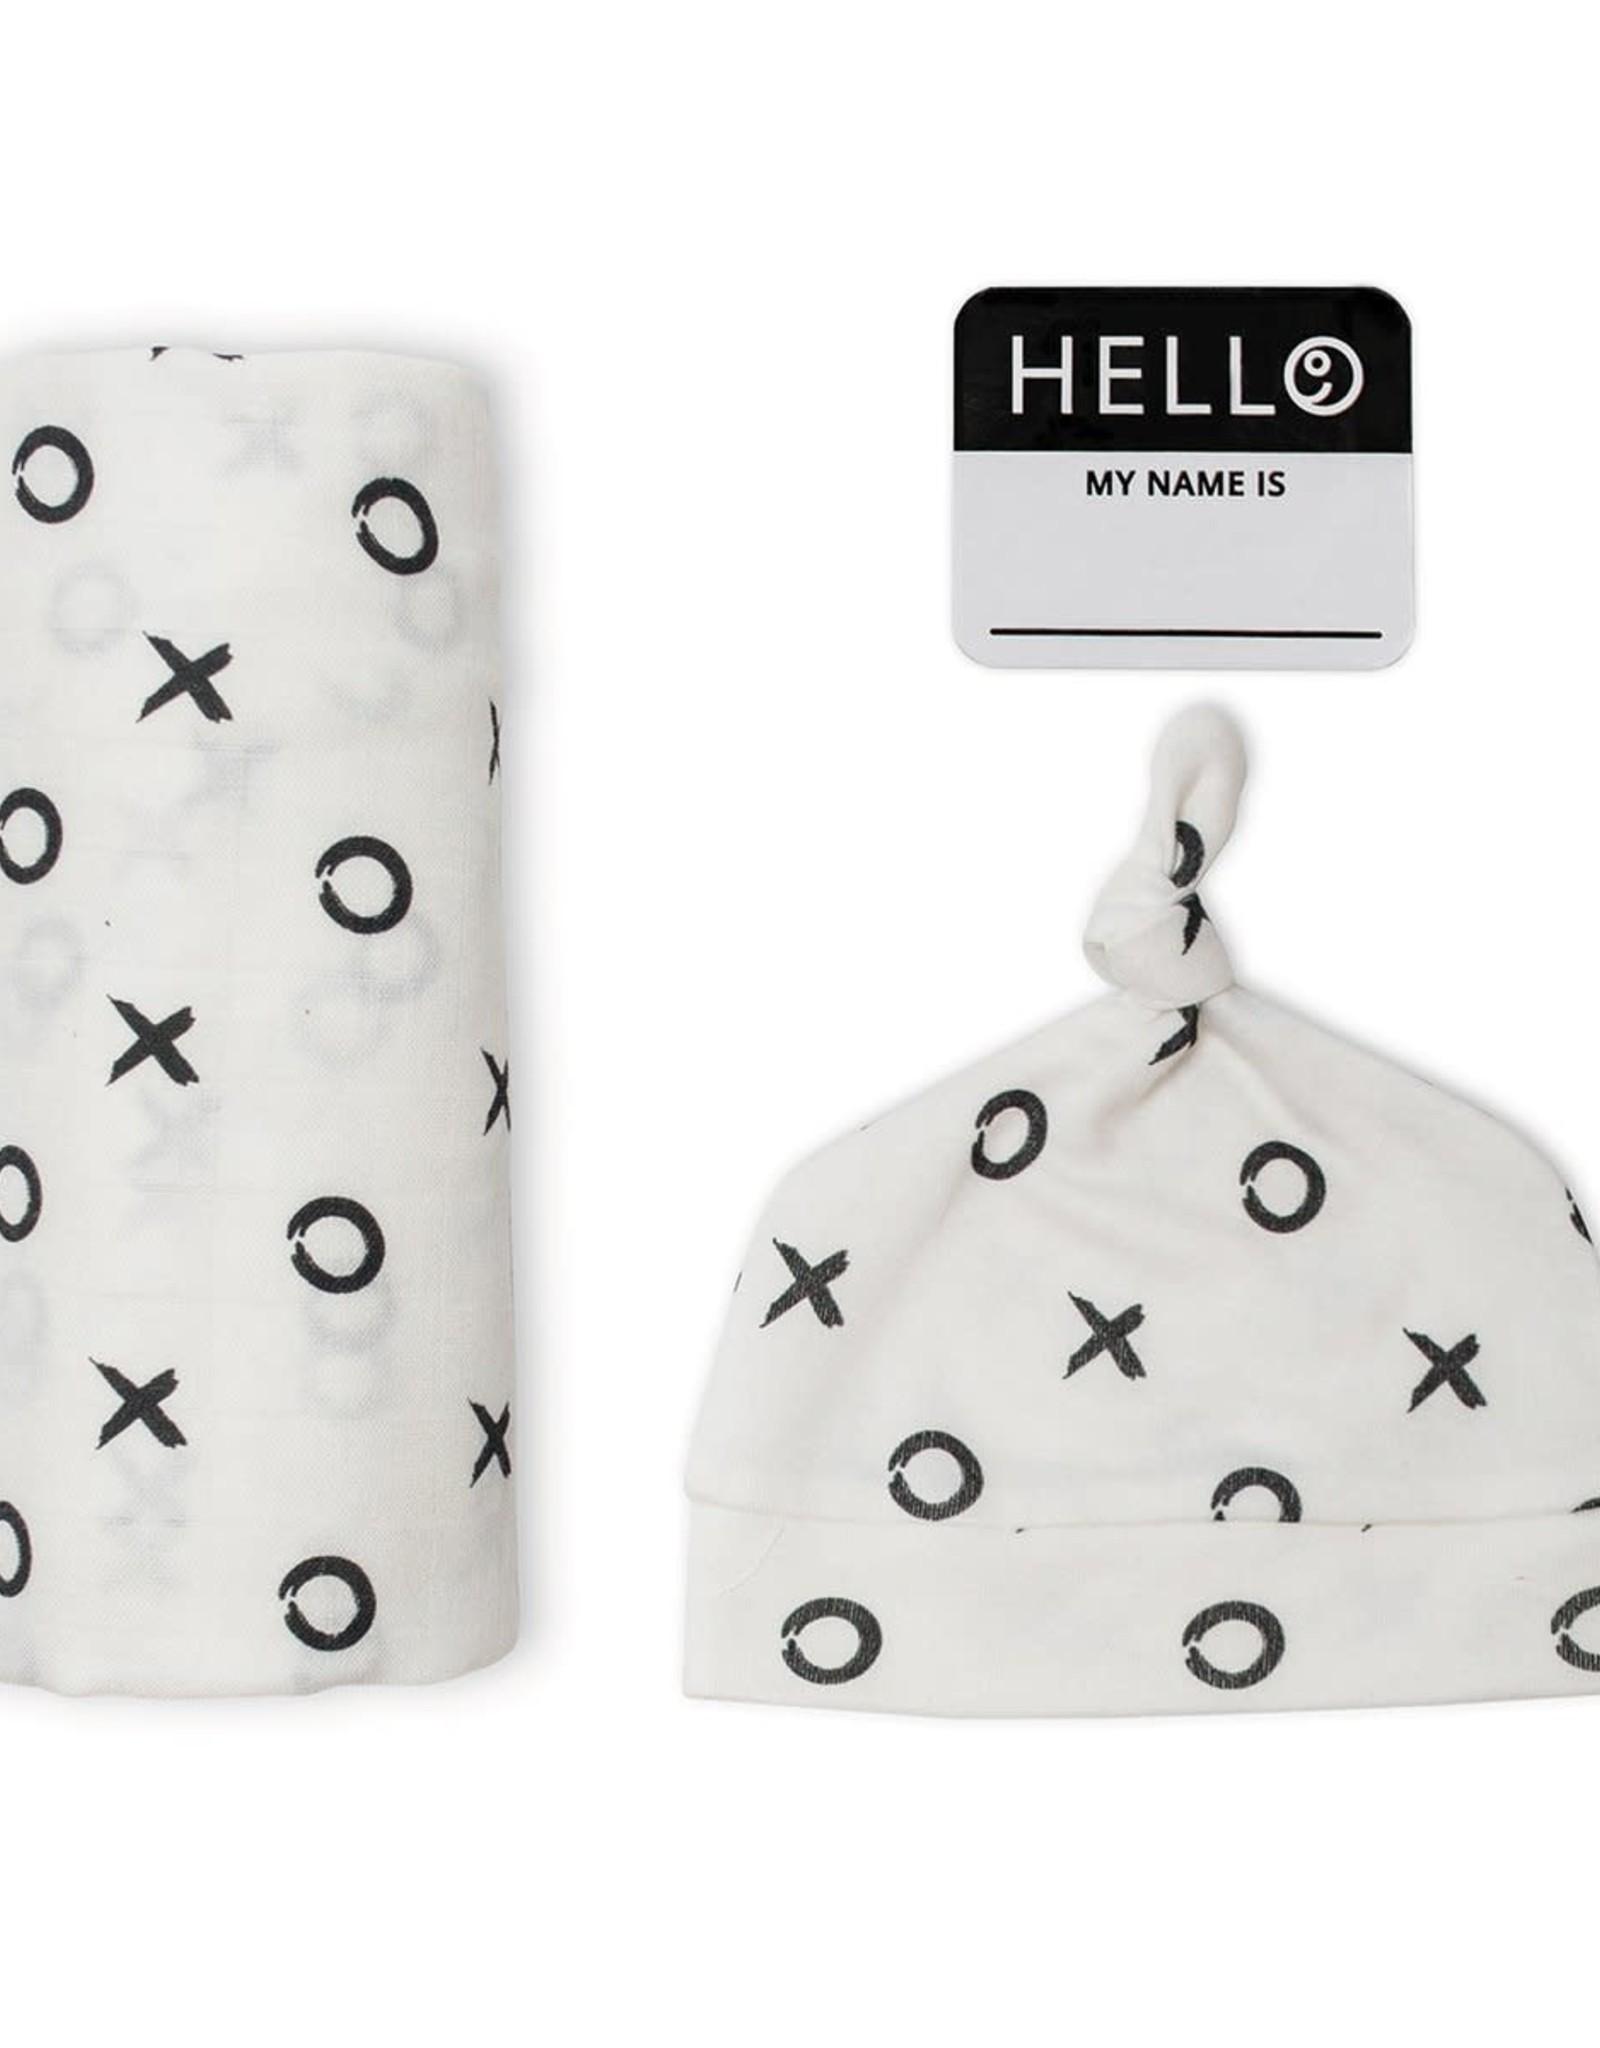 Lulujo Lulujo Hello World Swaddle Blanket & Knotted Hat Set - XO